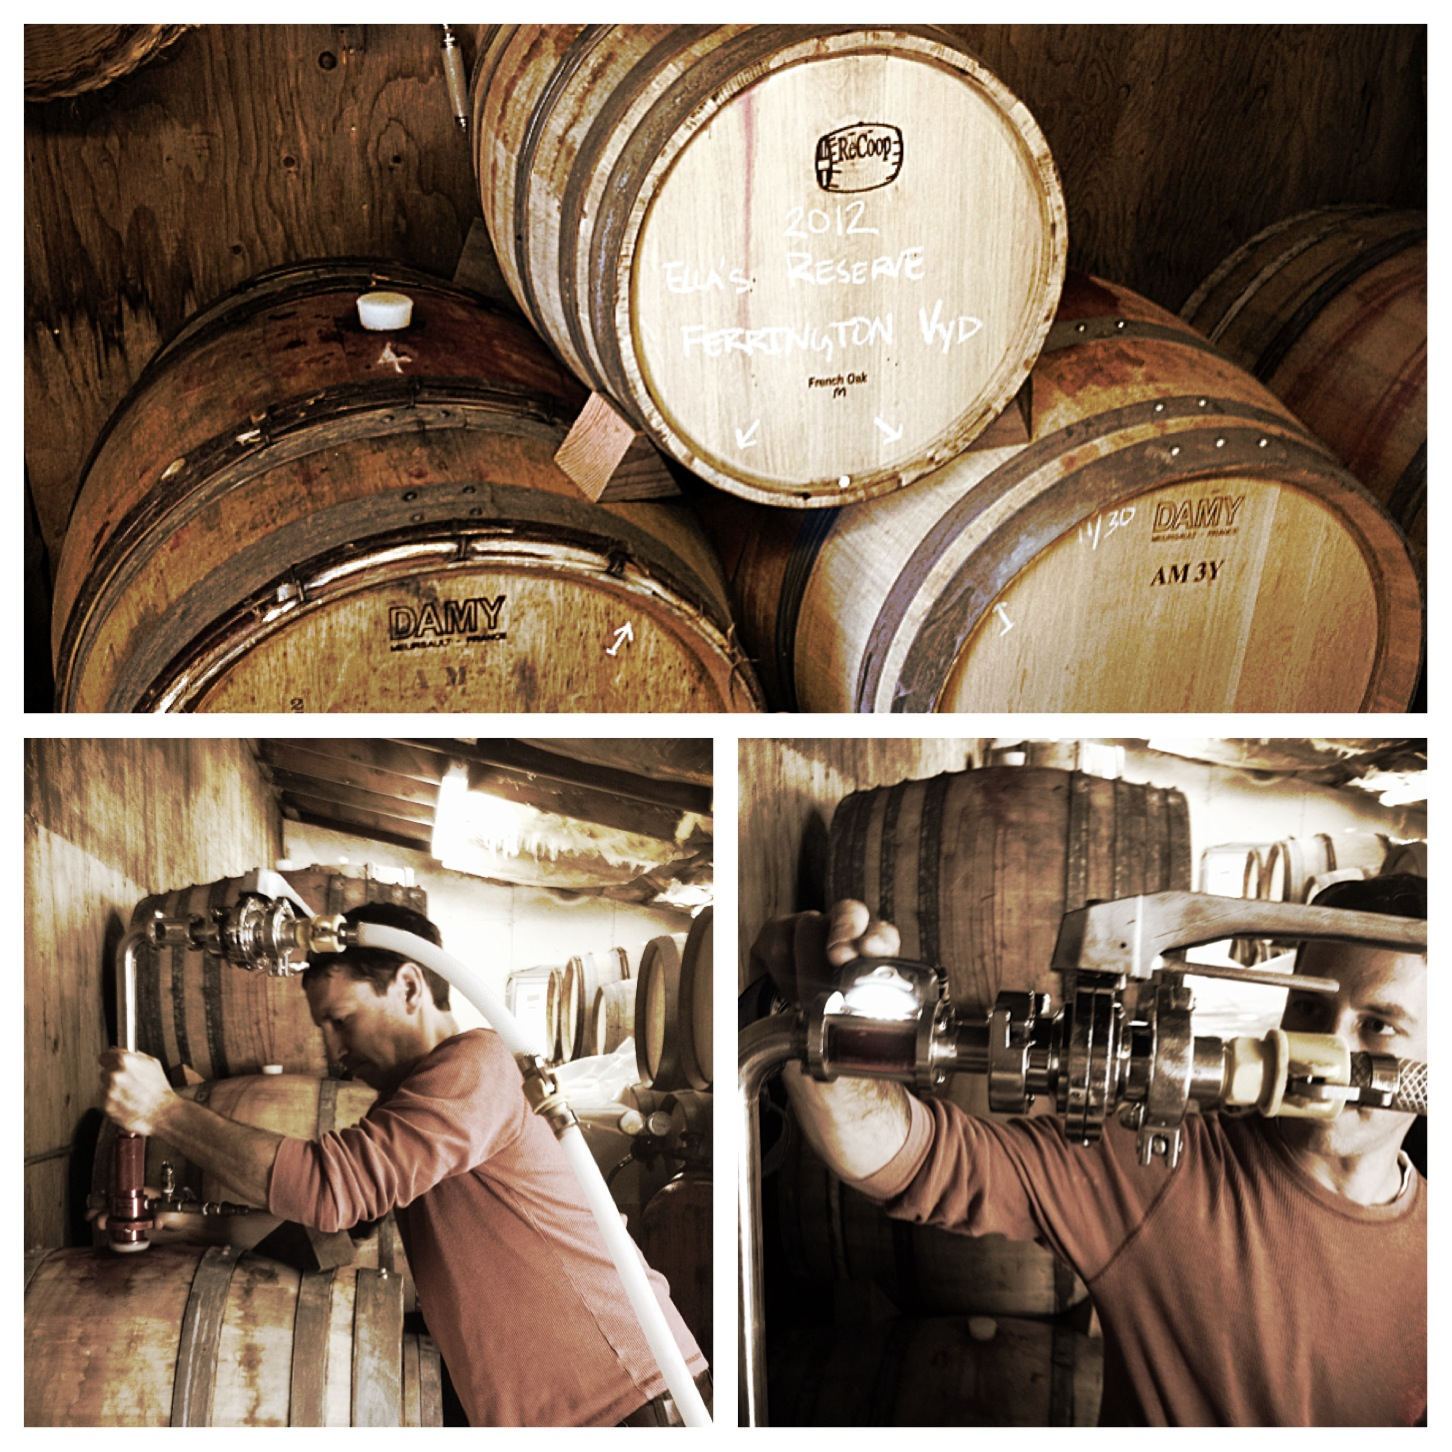 Barreling the wine.